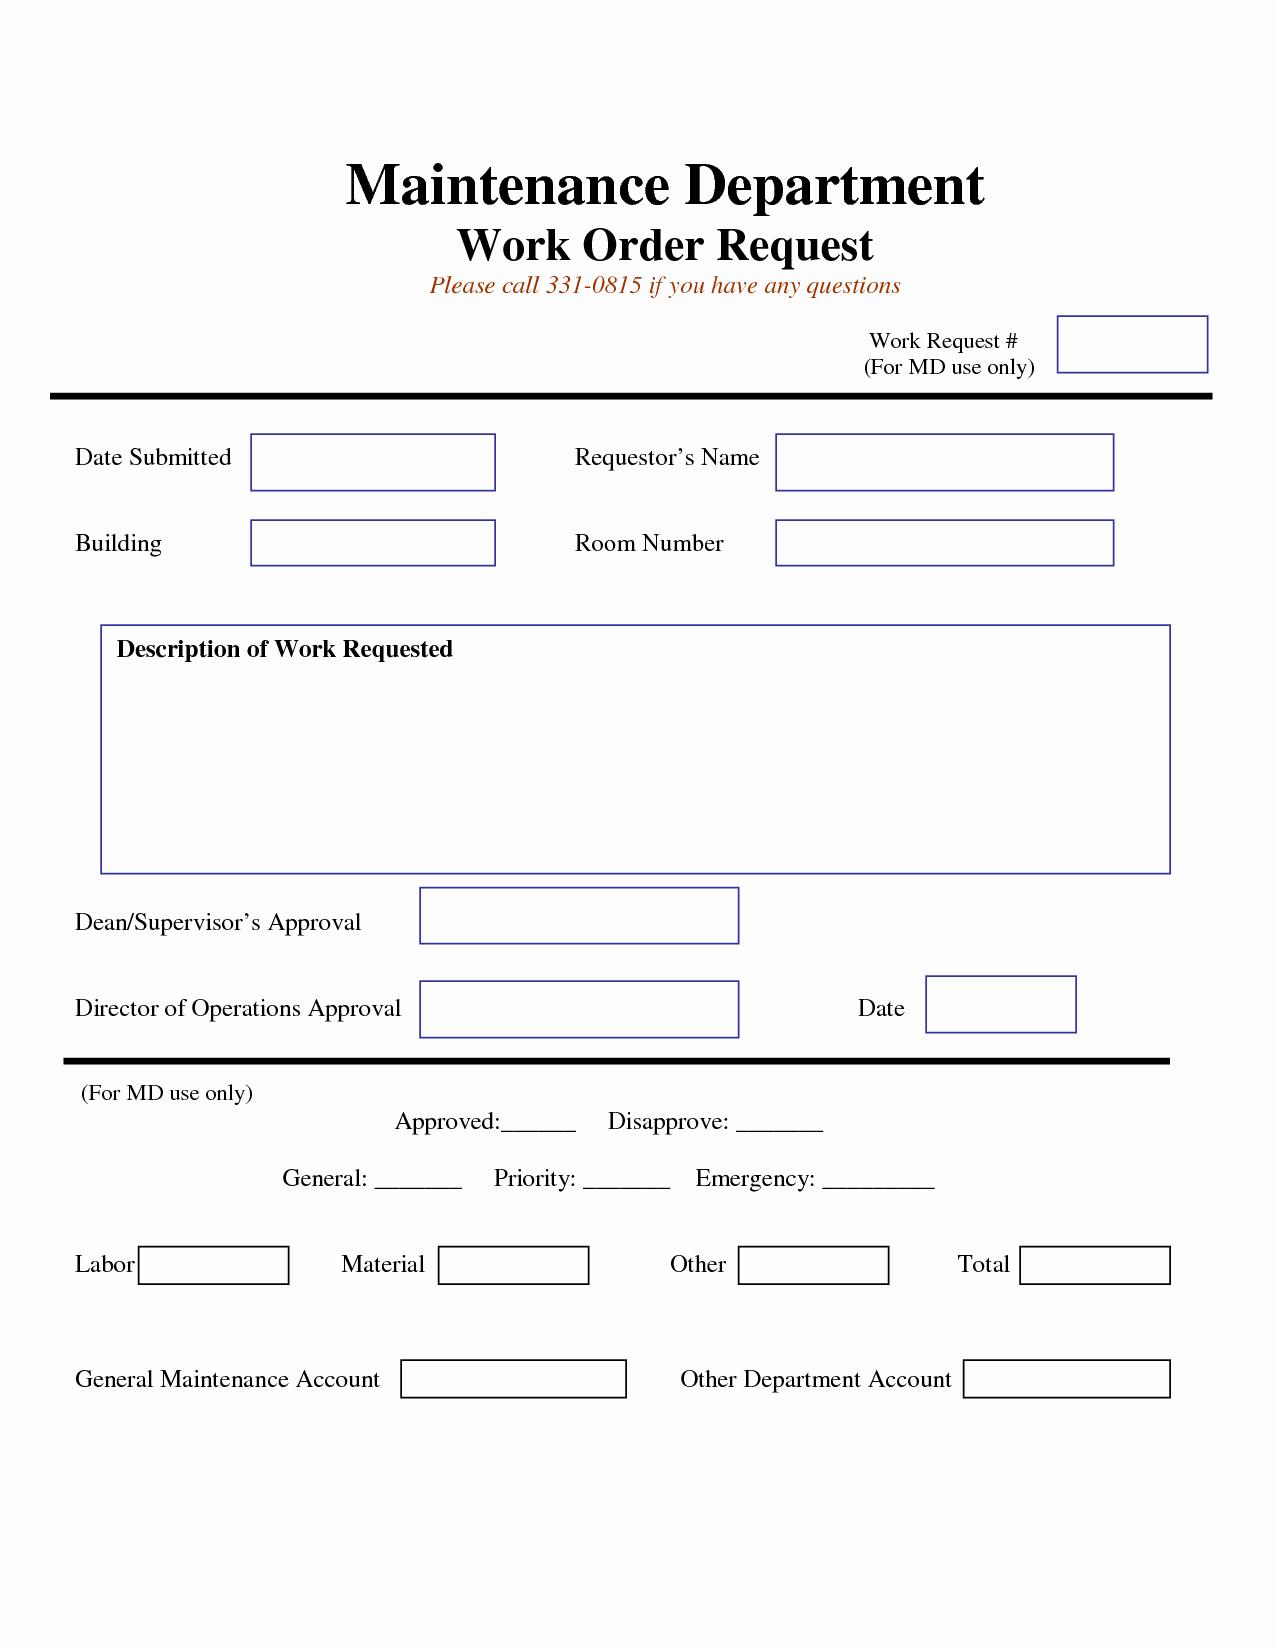 Maintenance Work order Template New Work Request form